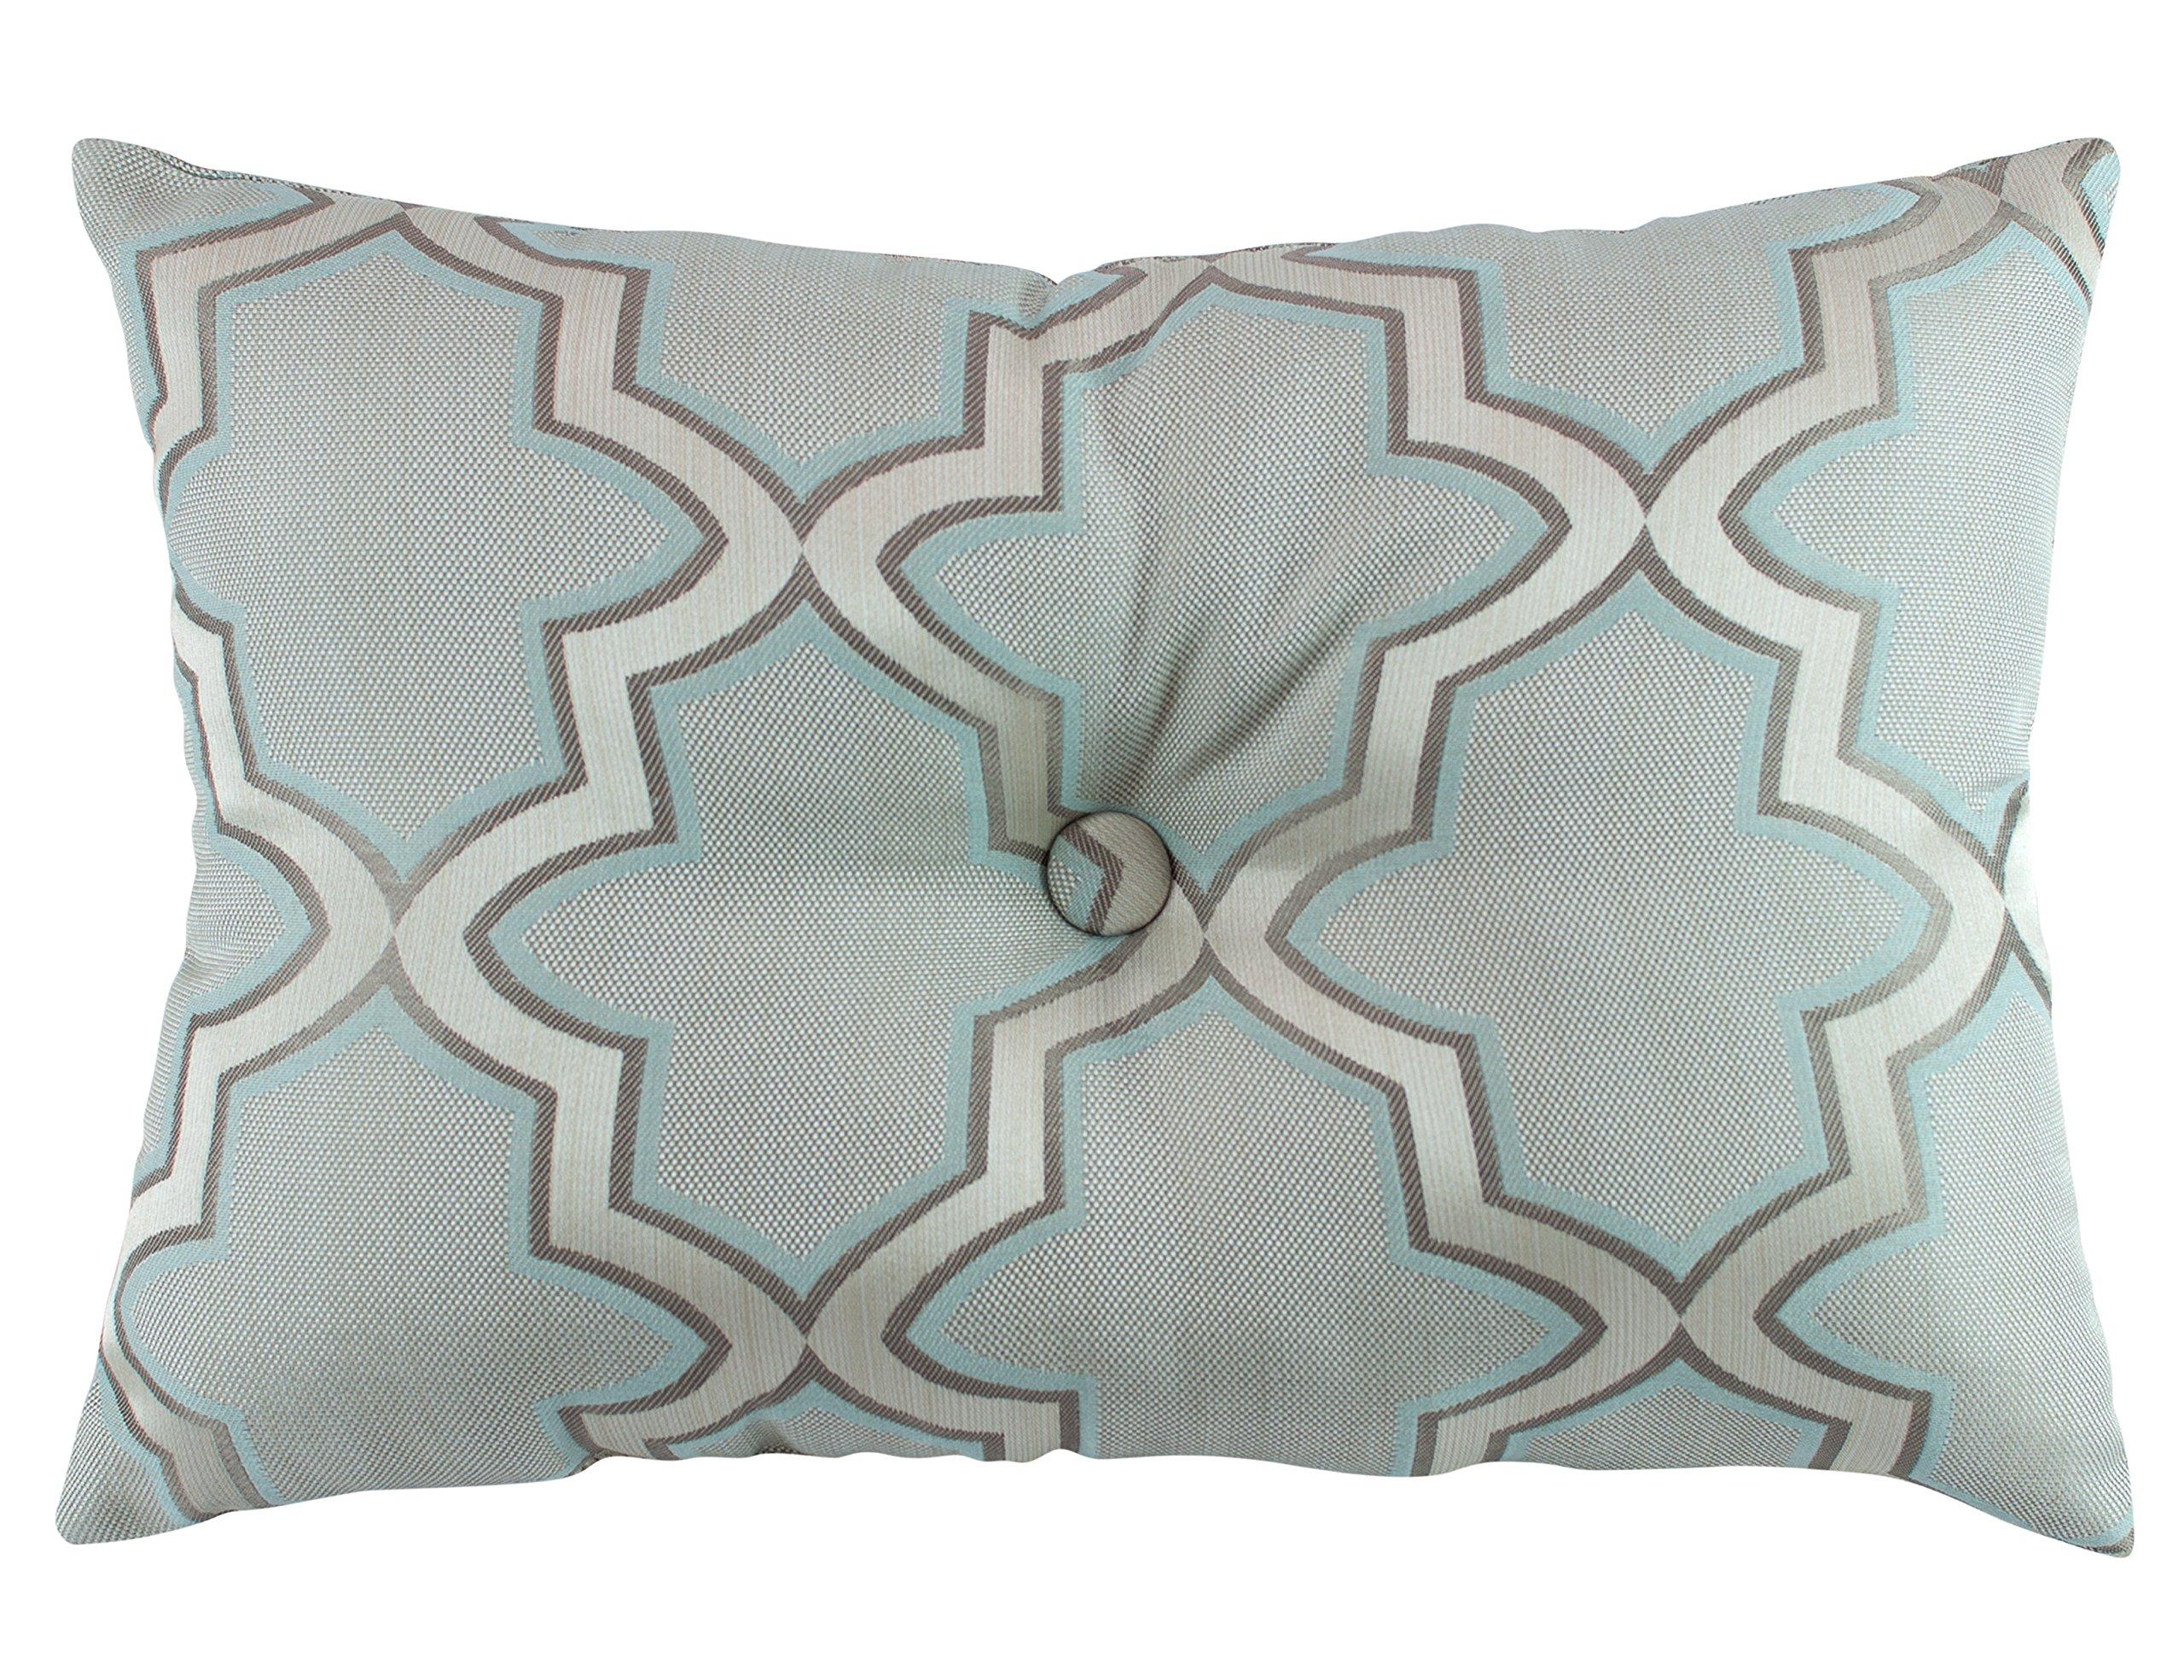 Austin Horn En' Vogue Glamour Boudoir Pillow, 14'' x 20'', Spa Blue